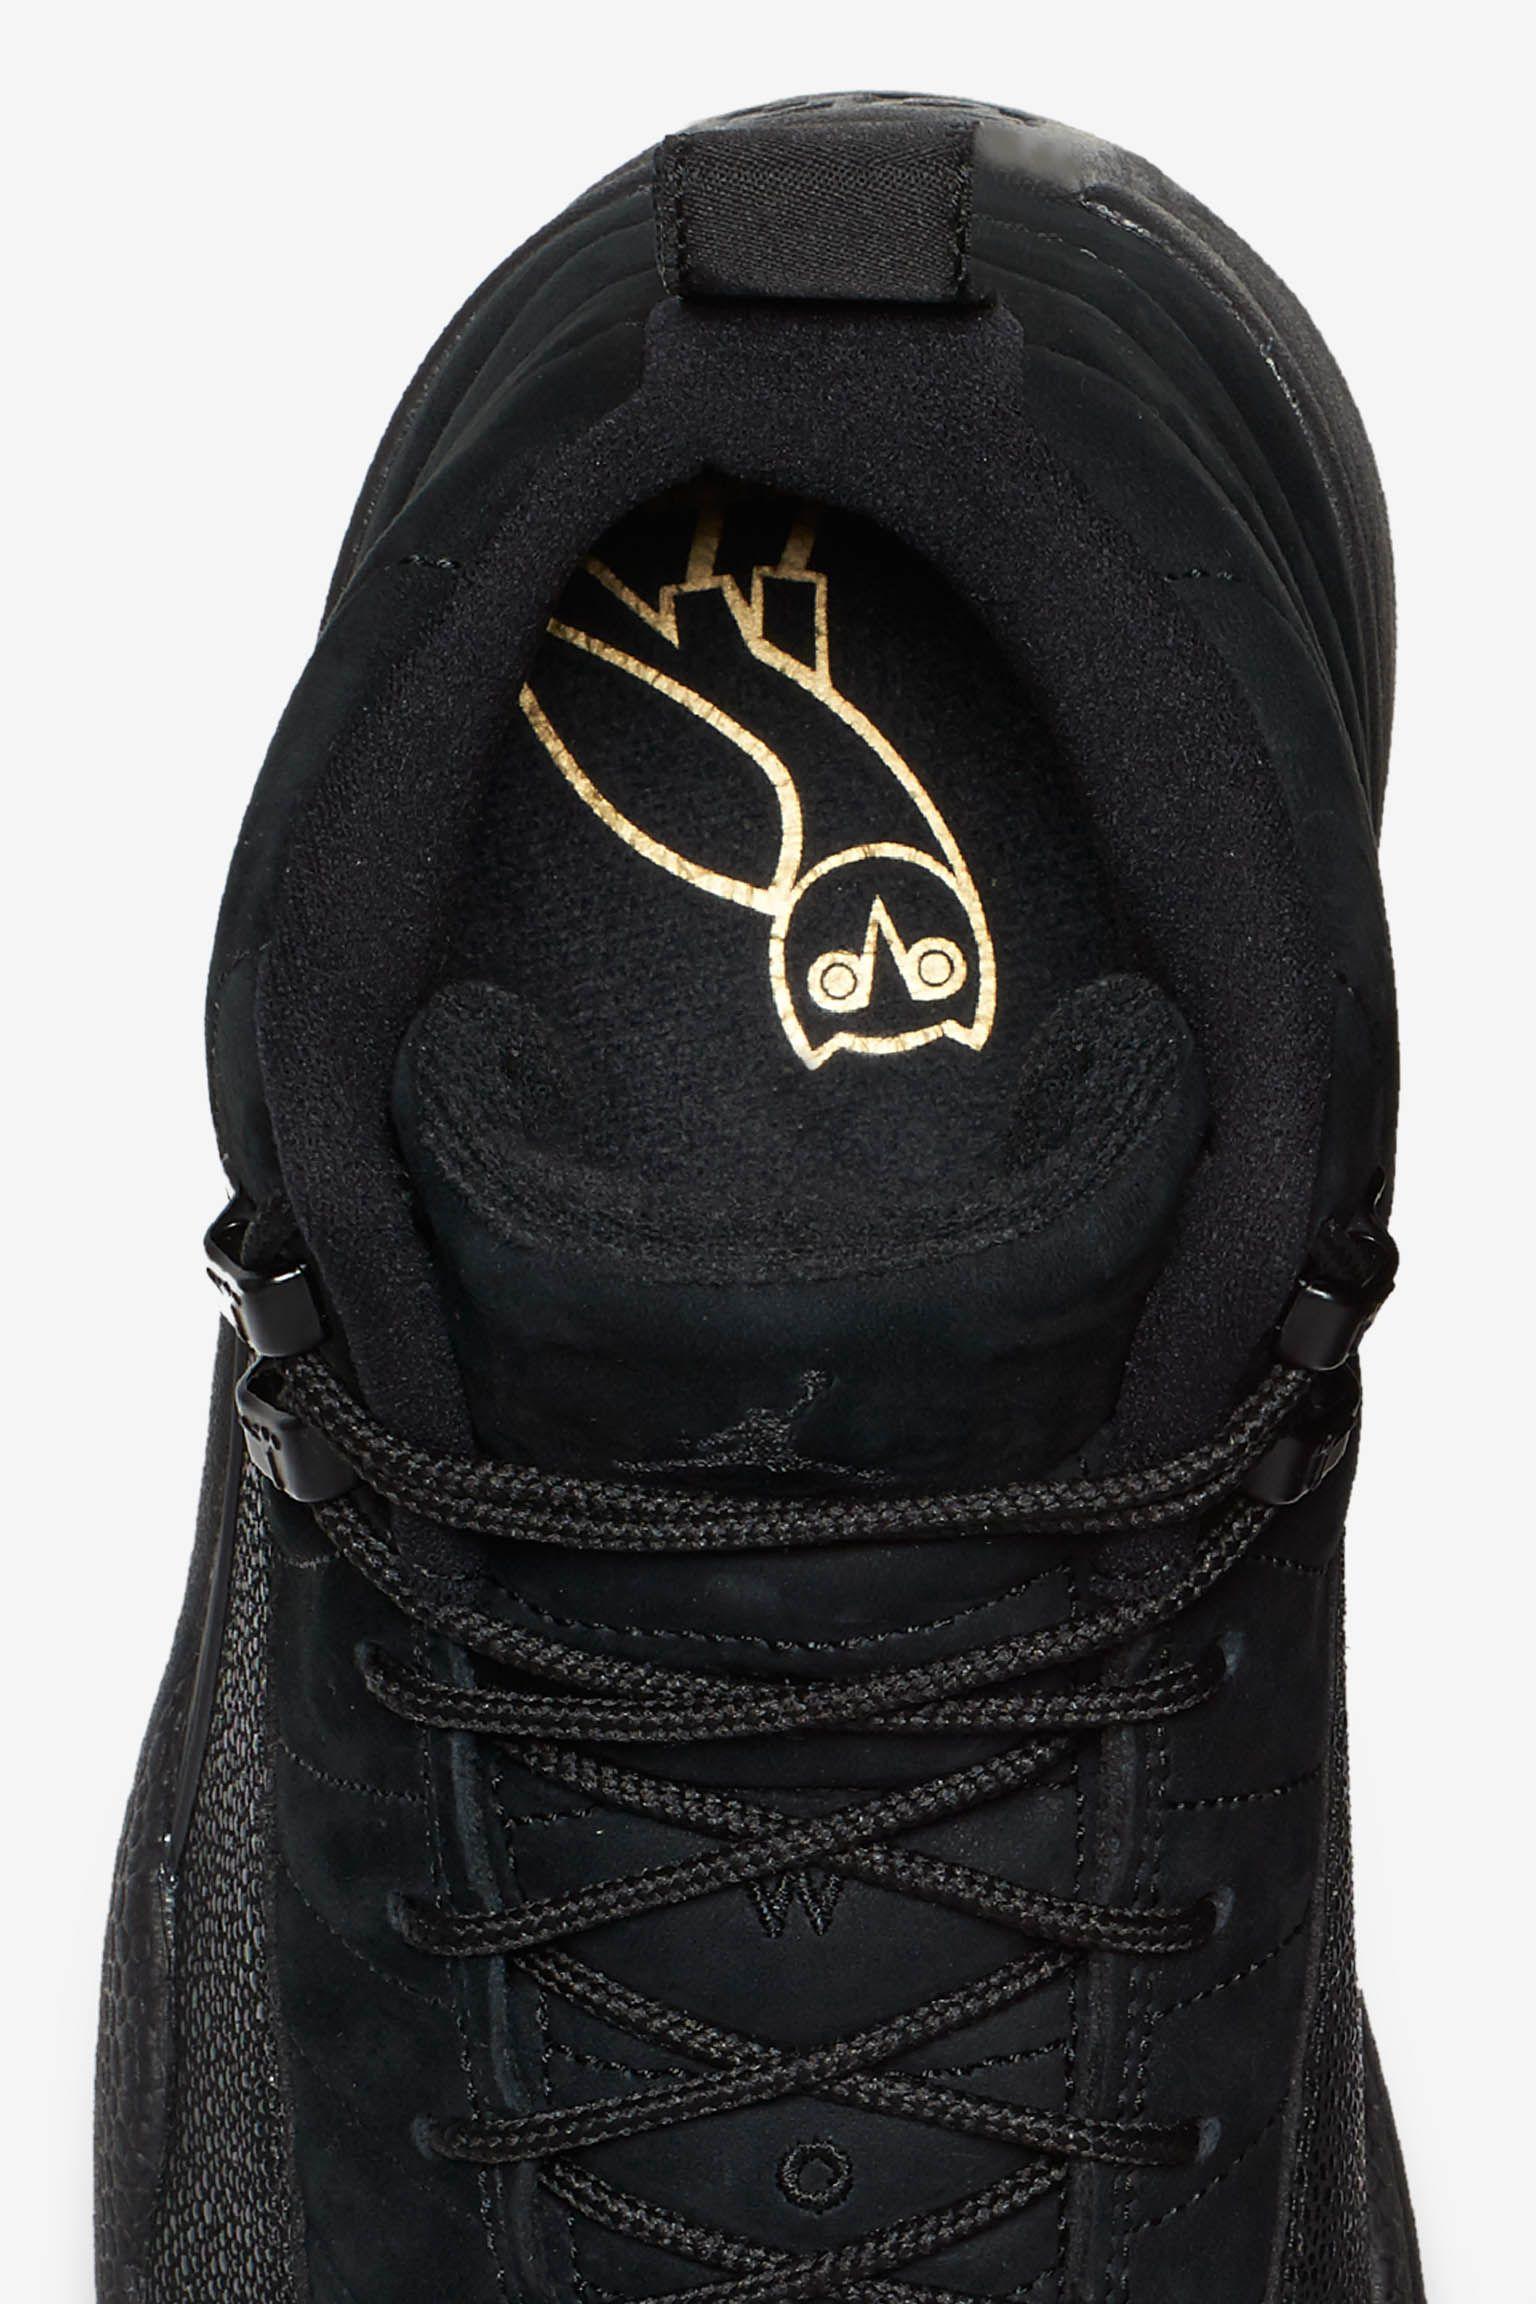 Air Jordan 12 Retro OVO 'Black & Metallic Gold'